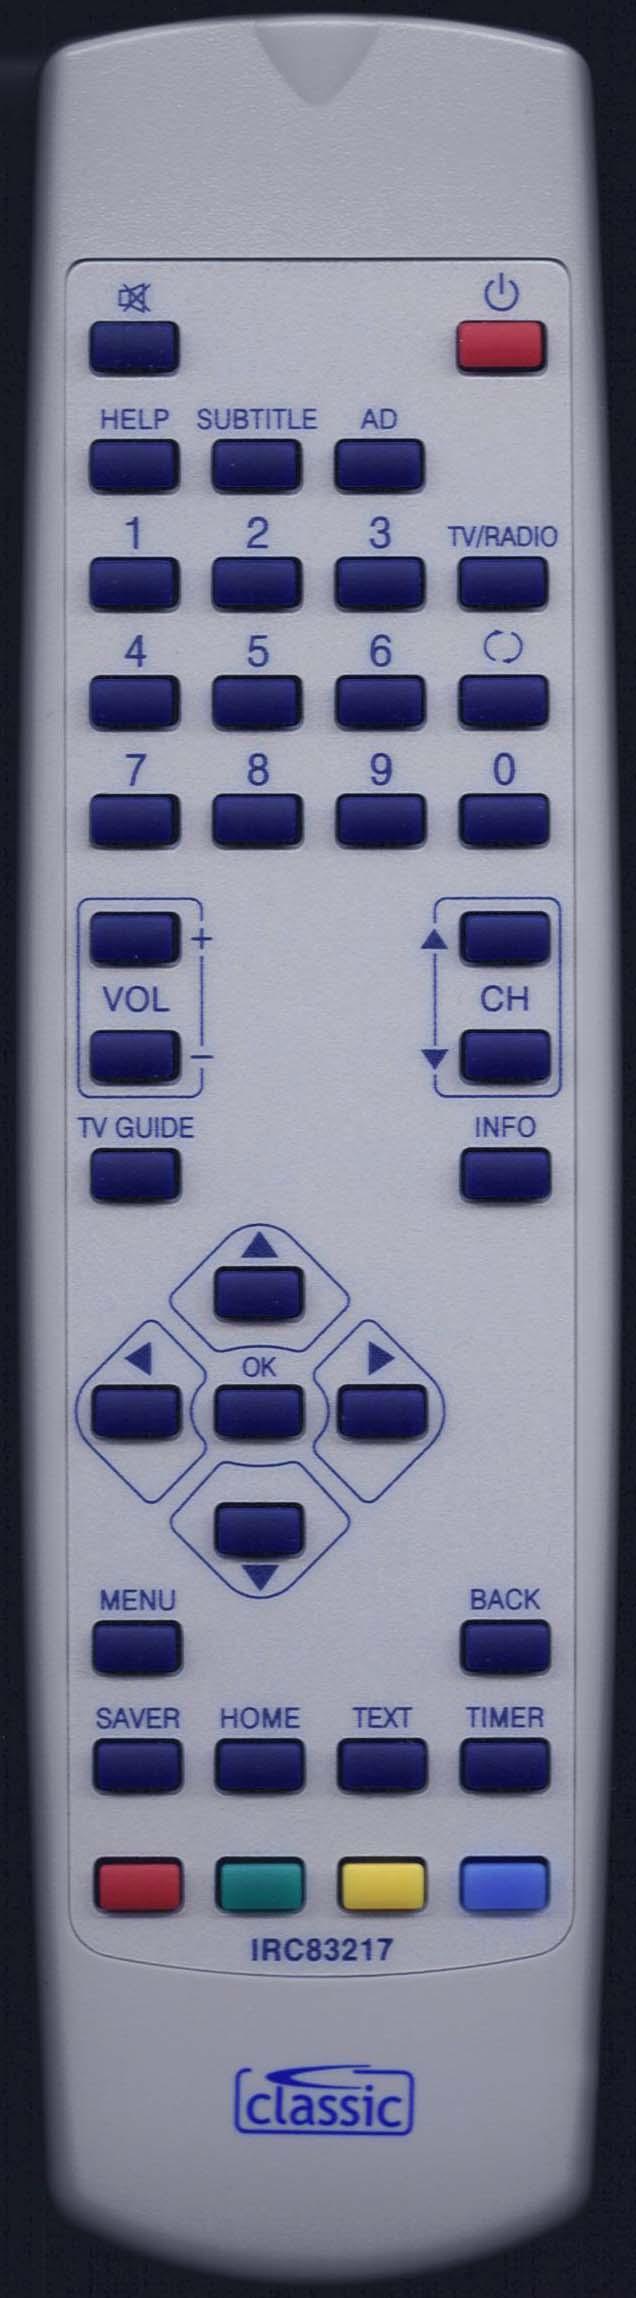 TVONICS MFR-200 Replacement Remote Control